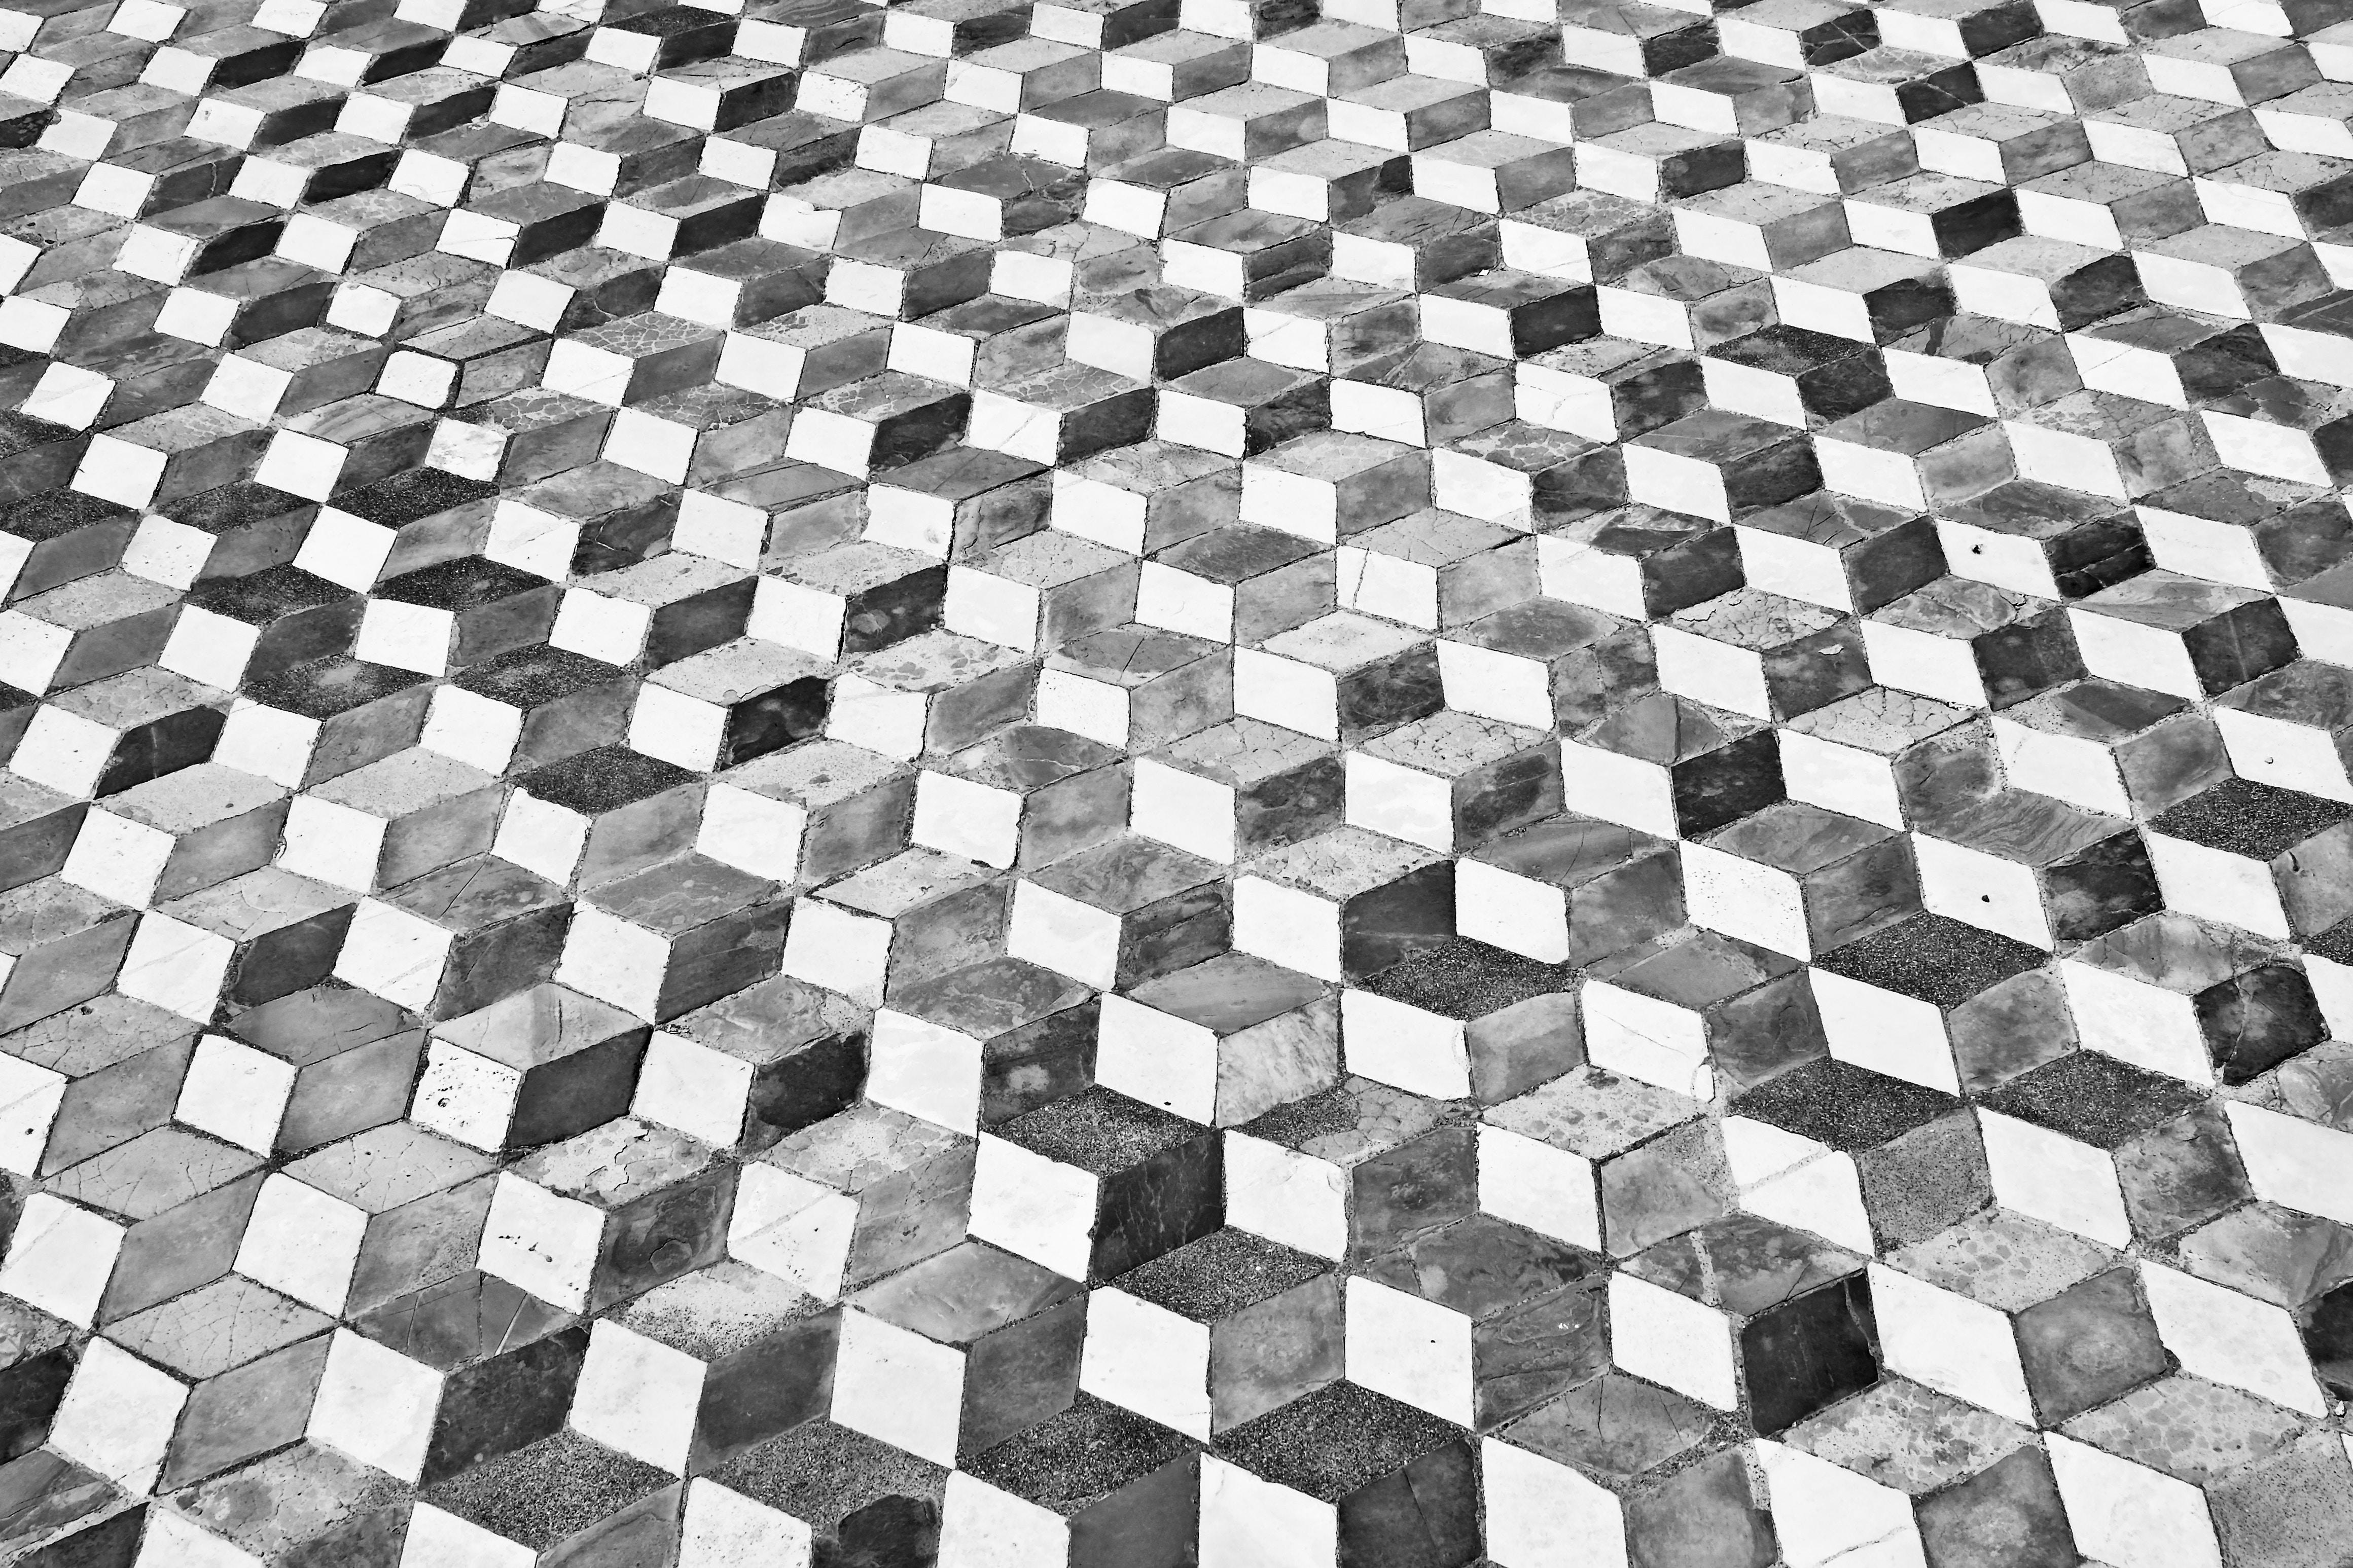 daniele-levis-pelusi-302195-unsplash